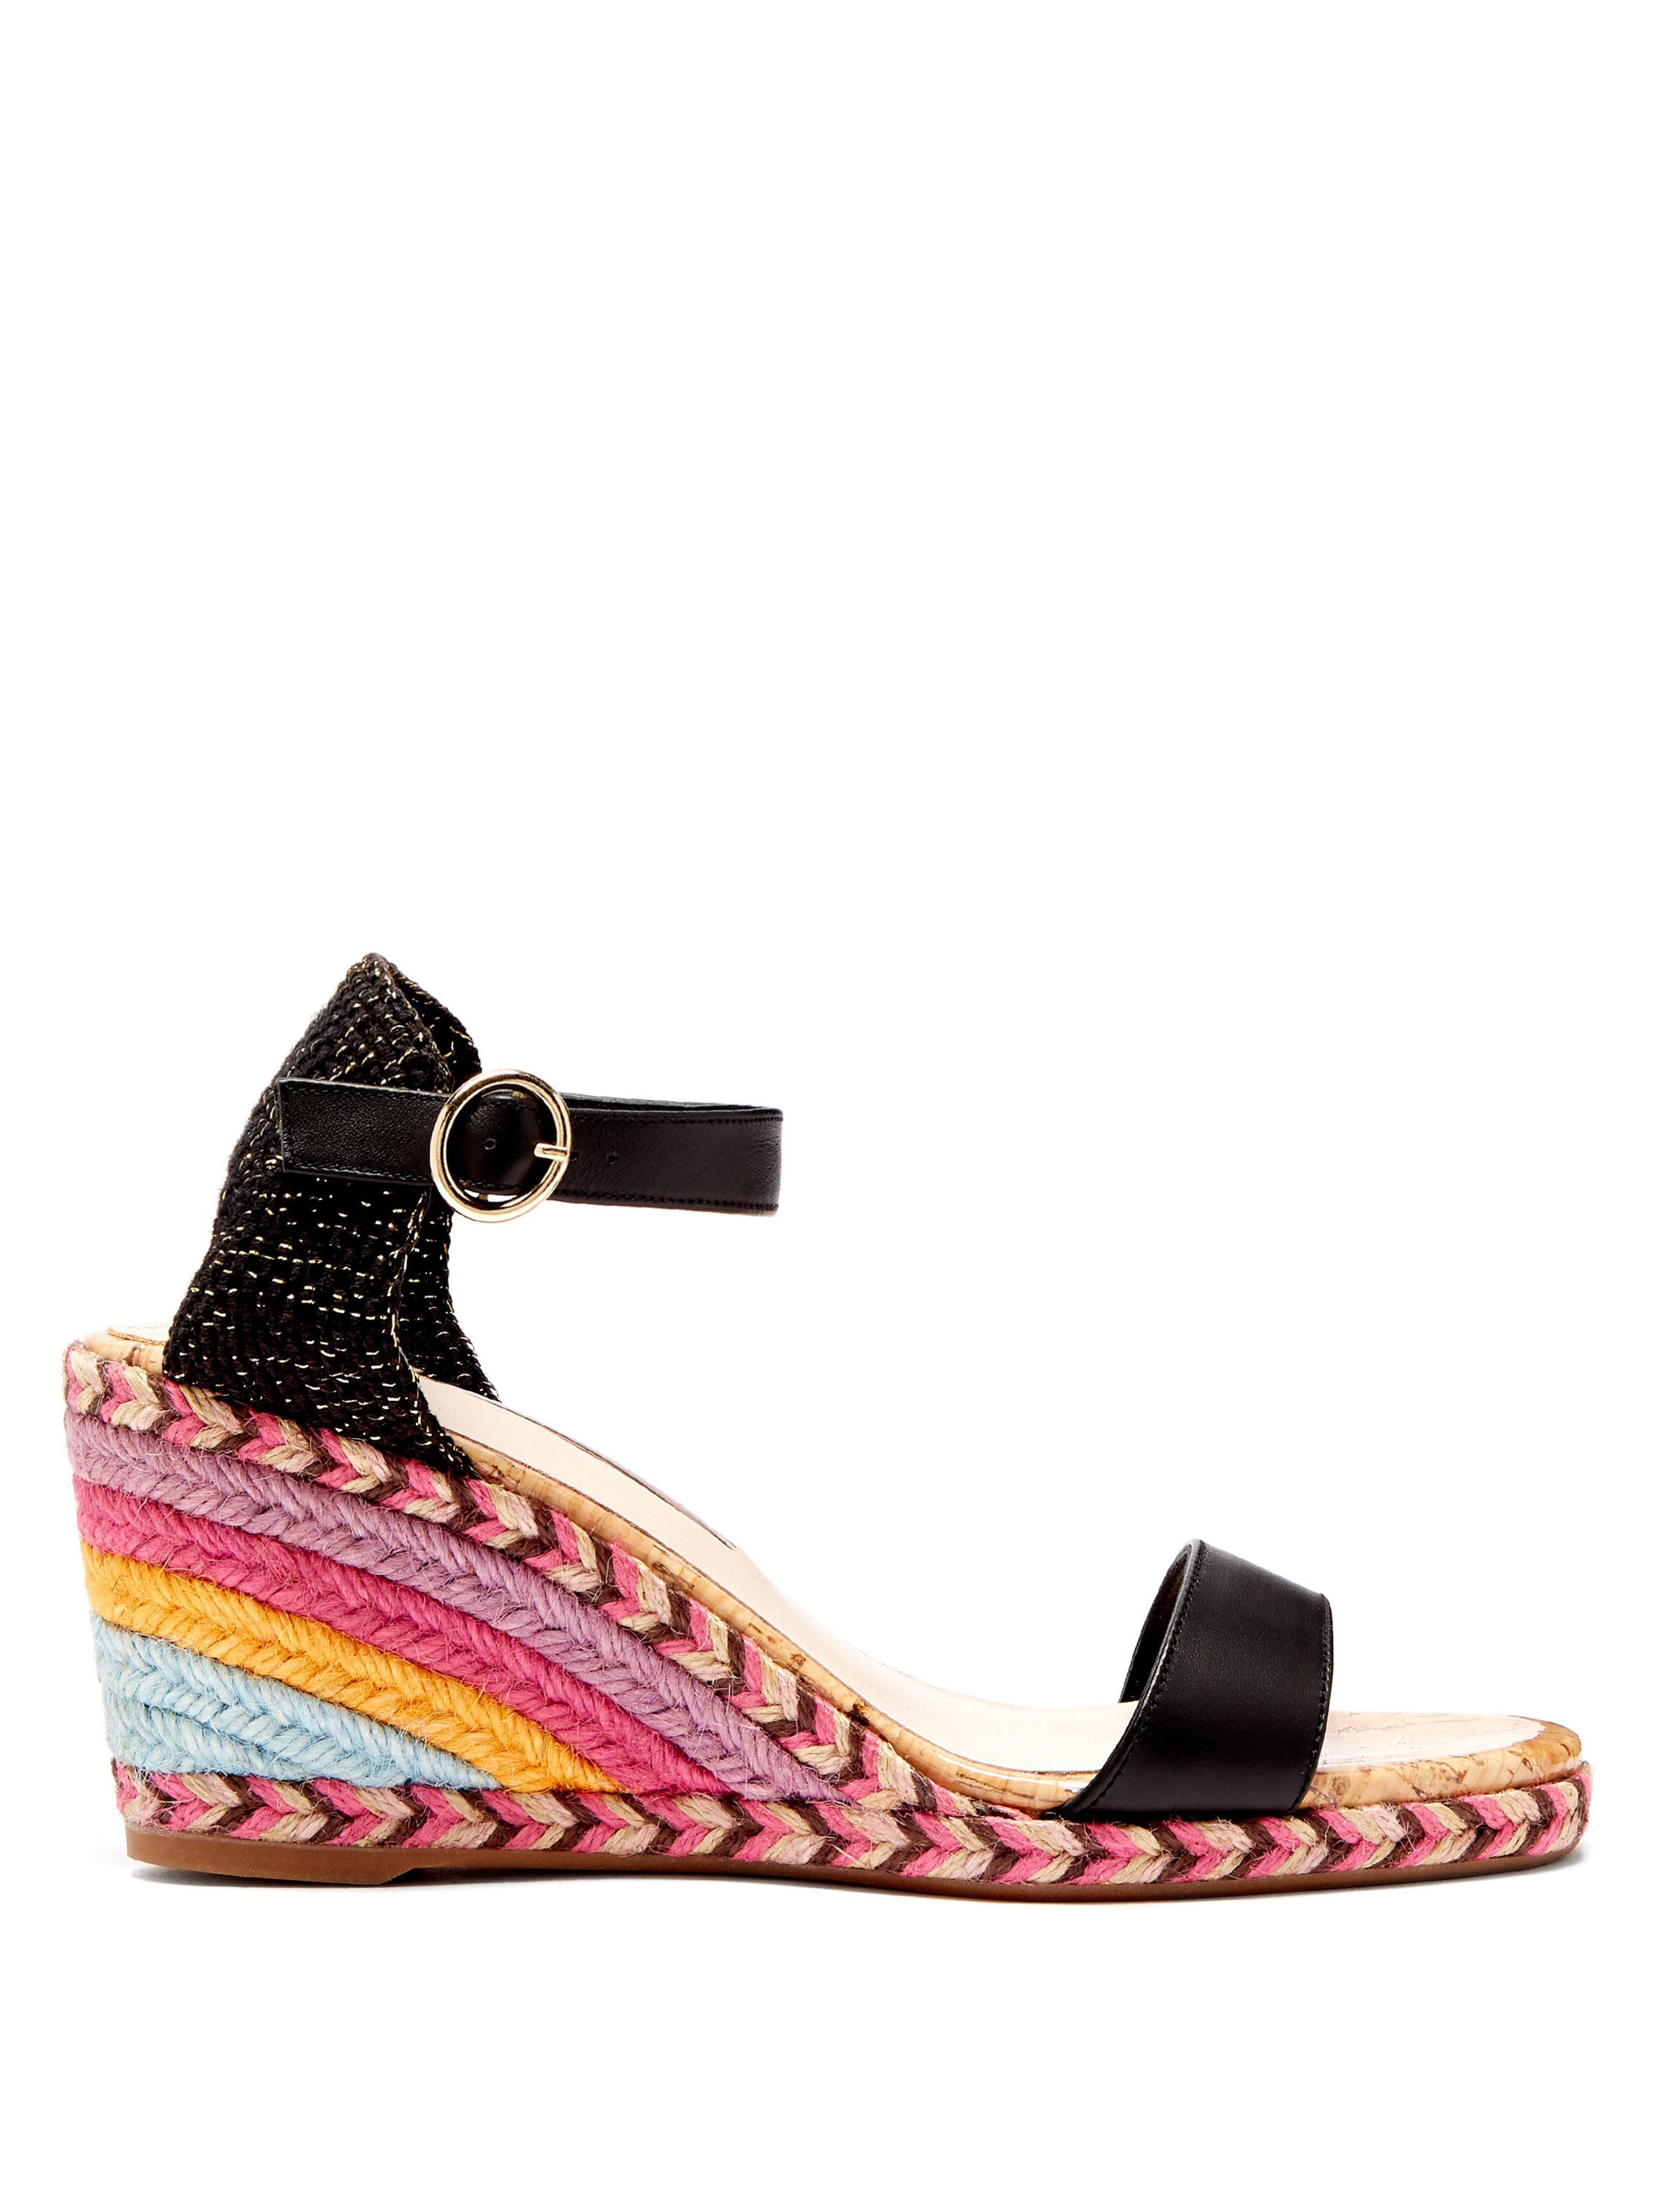 3db1dc02234 Sophia Webster Lucita Wedge Sandals in Black - Save 16% - Lyst